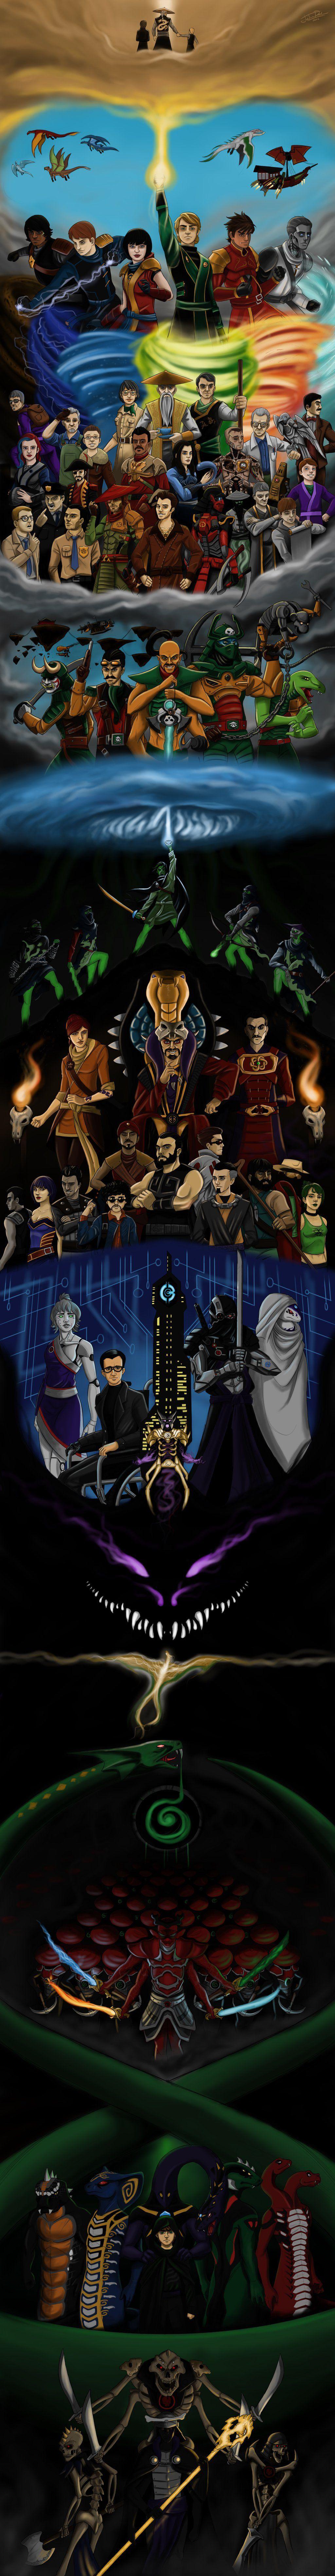 ultimate ninjago posterjoshuad17  lego ninjago movie